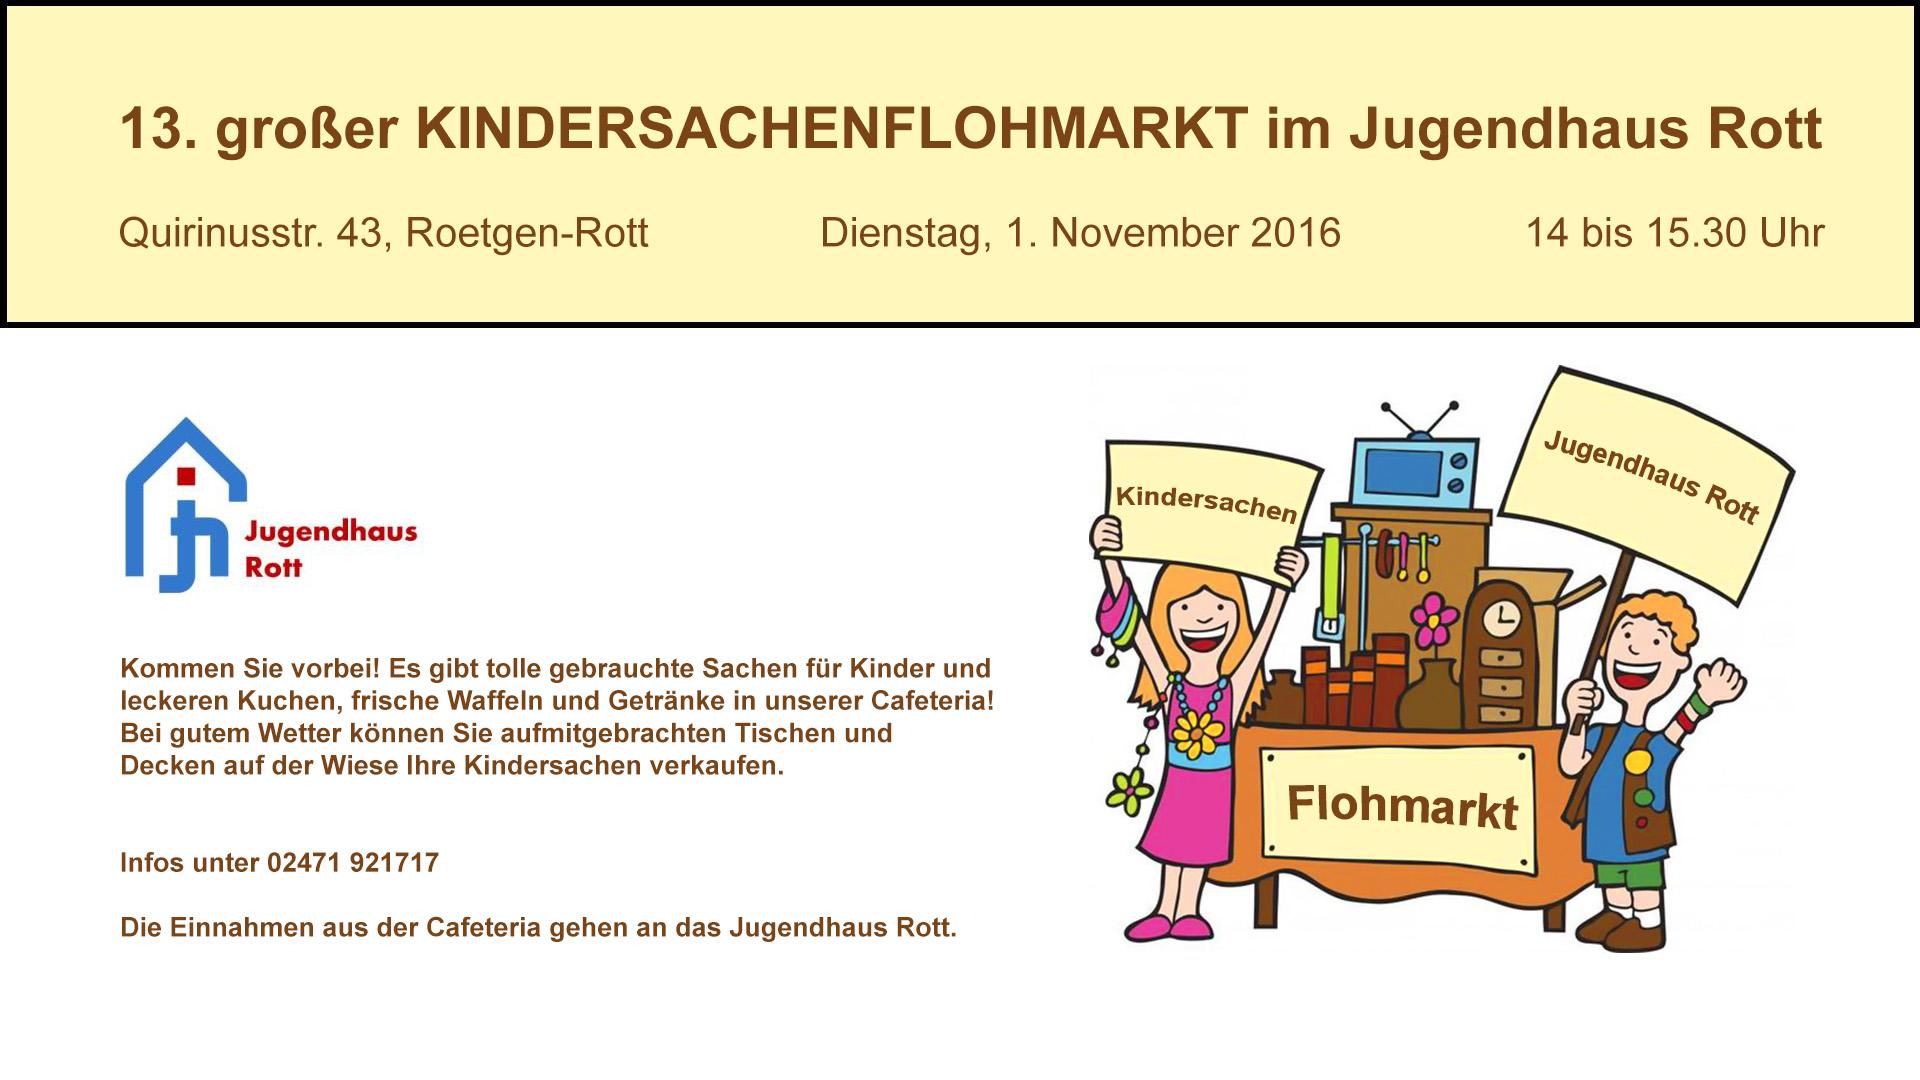 flohmarkt-jugendhaus-rott